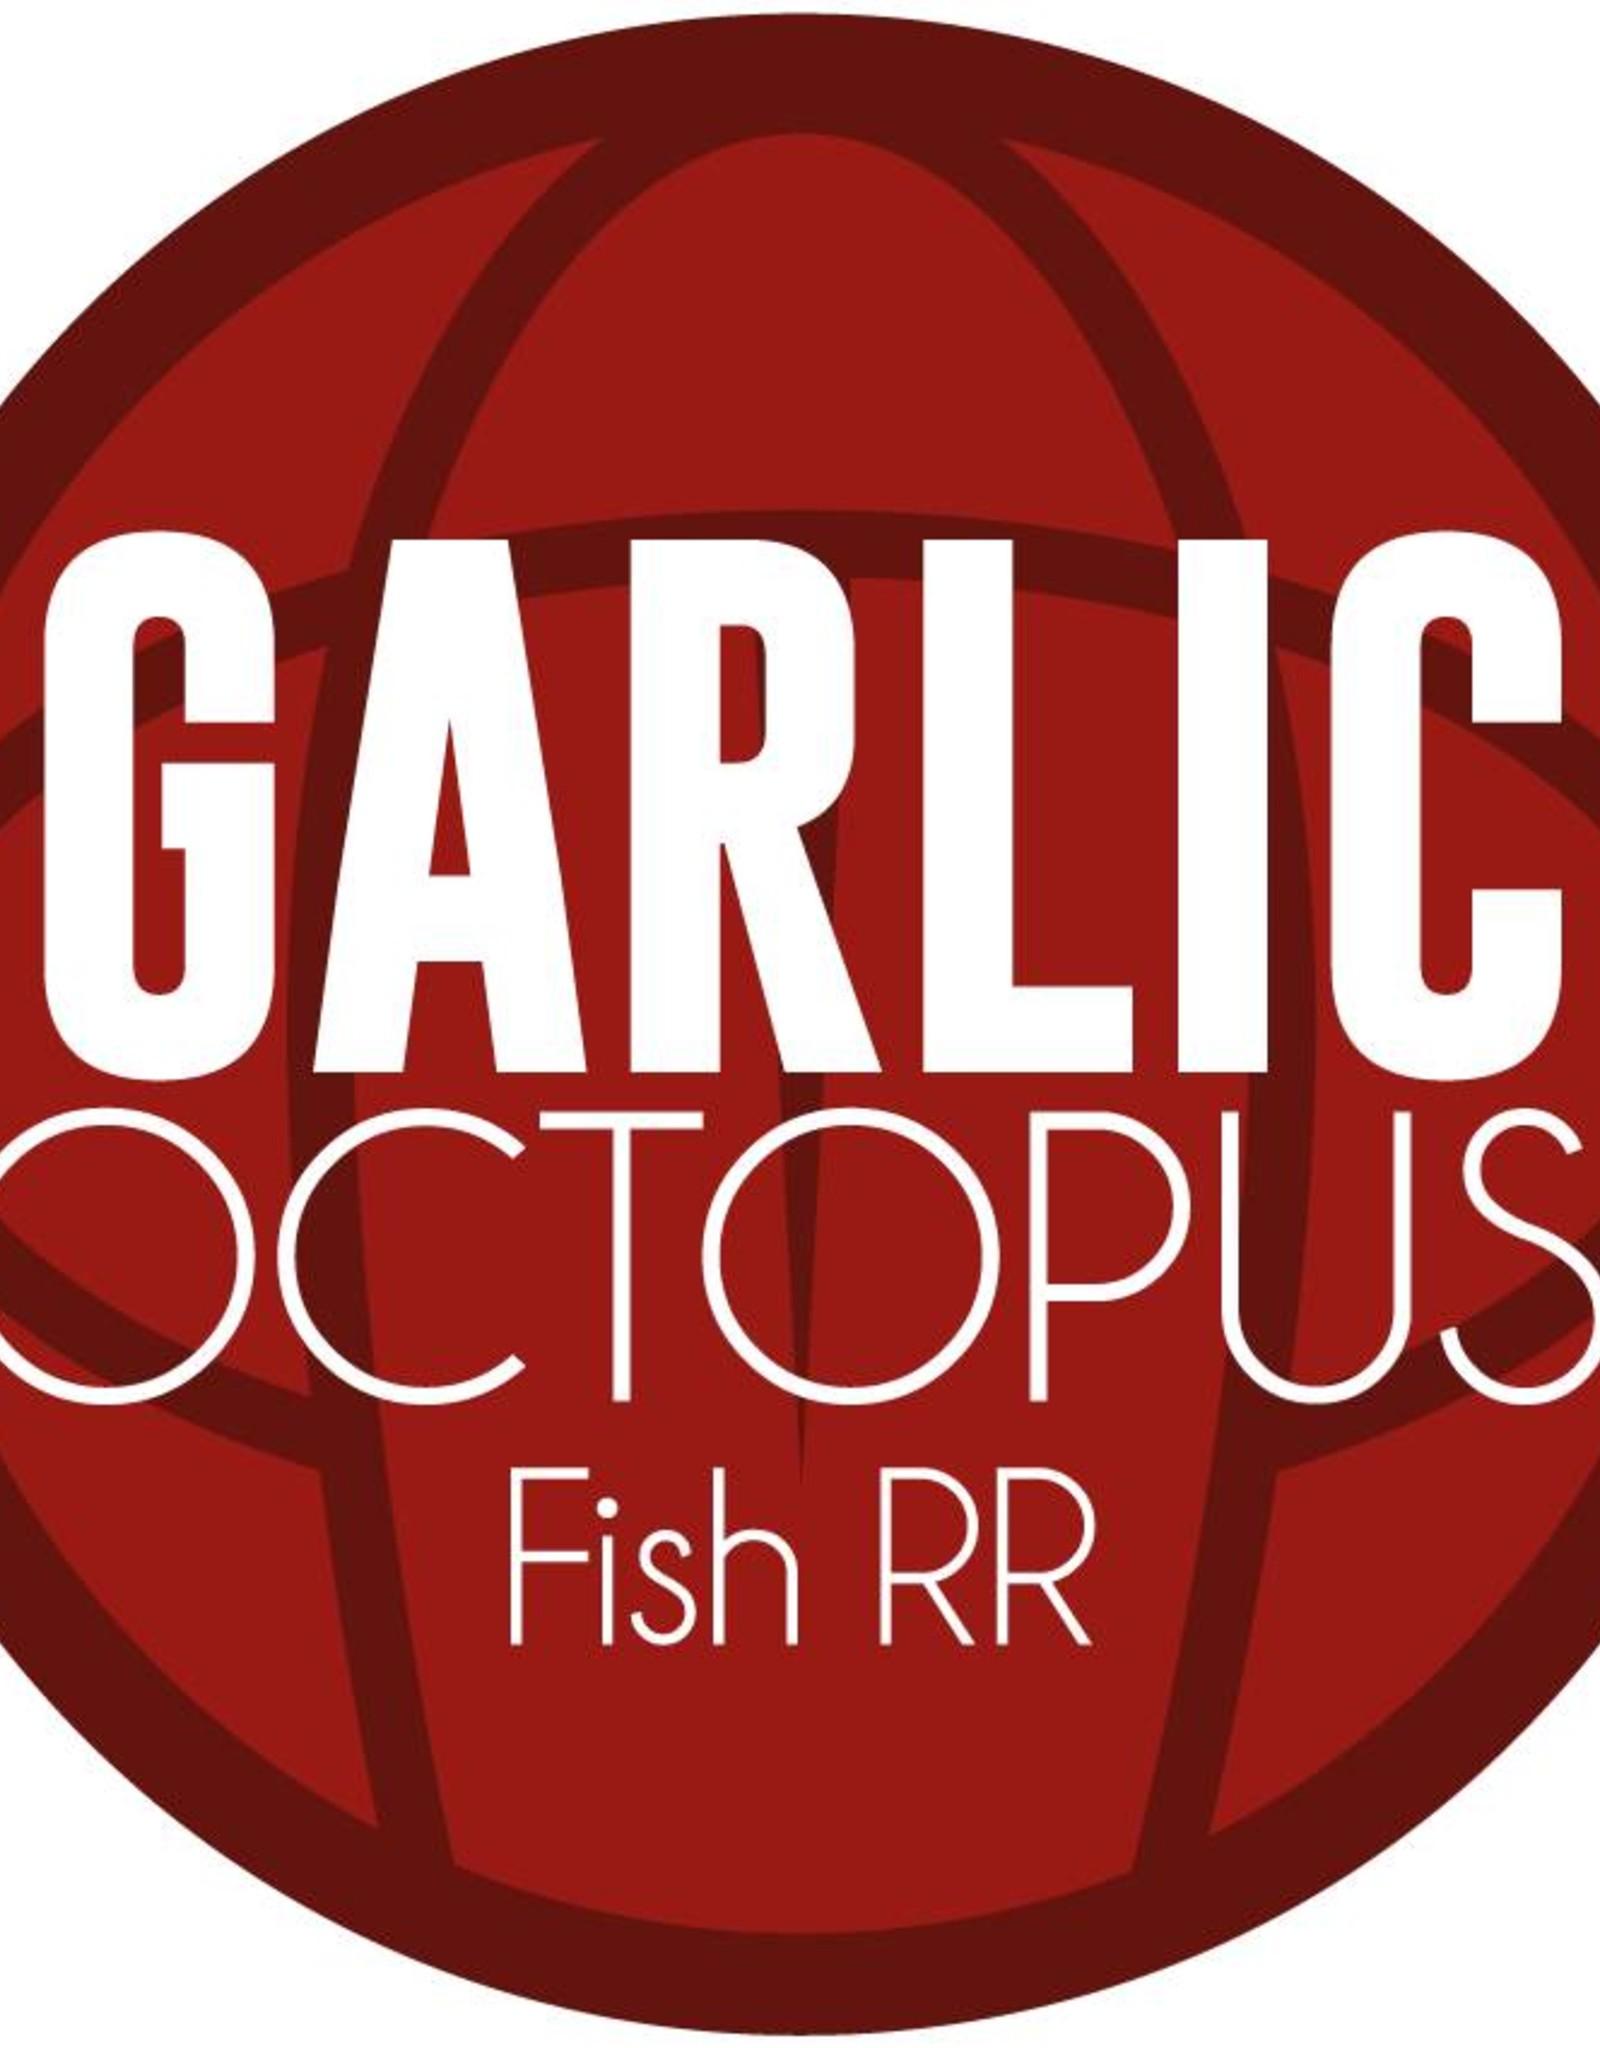 Baitworld Baitworld Garlic Octopus Fish RR Pakket Deal 1